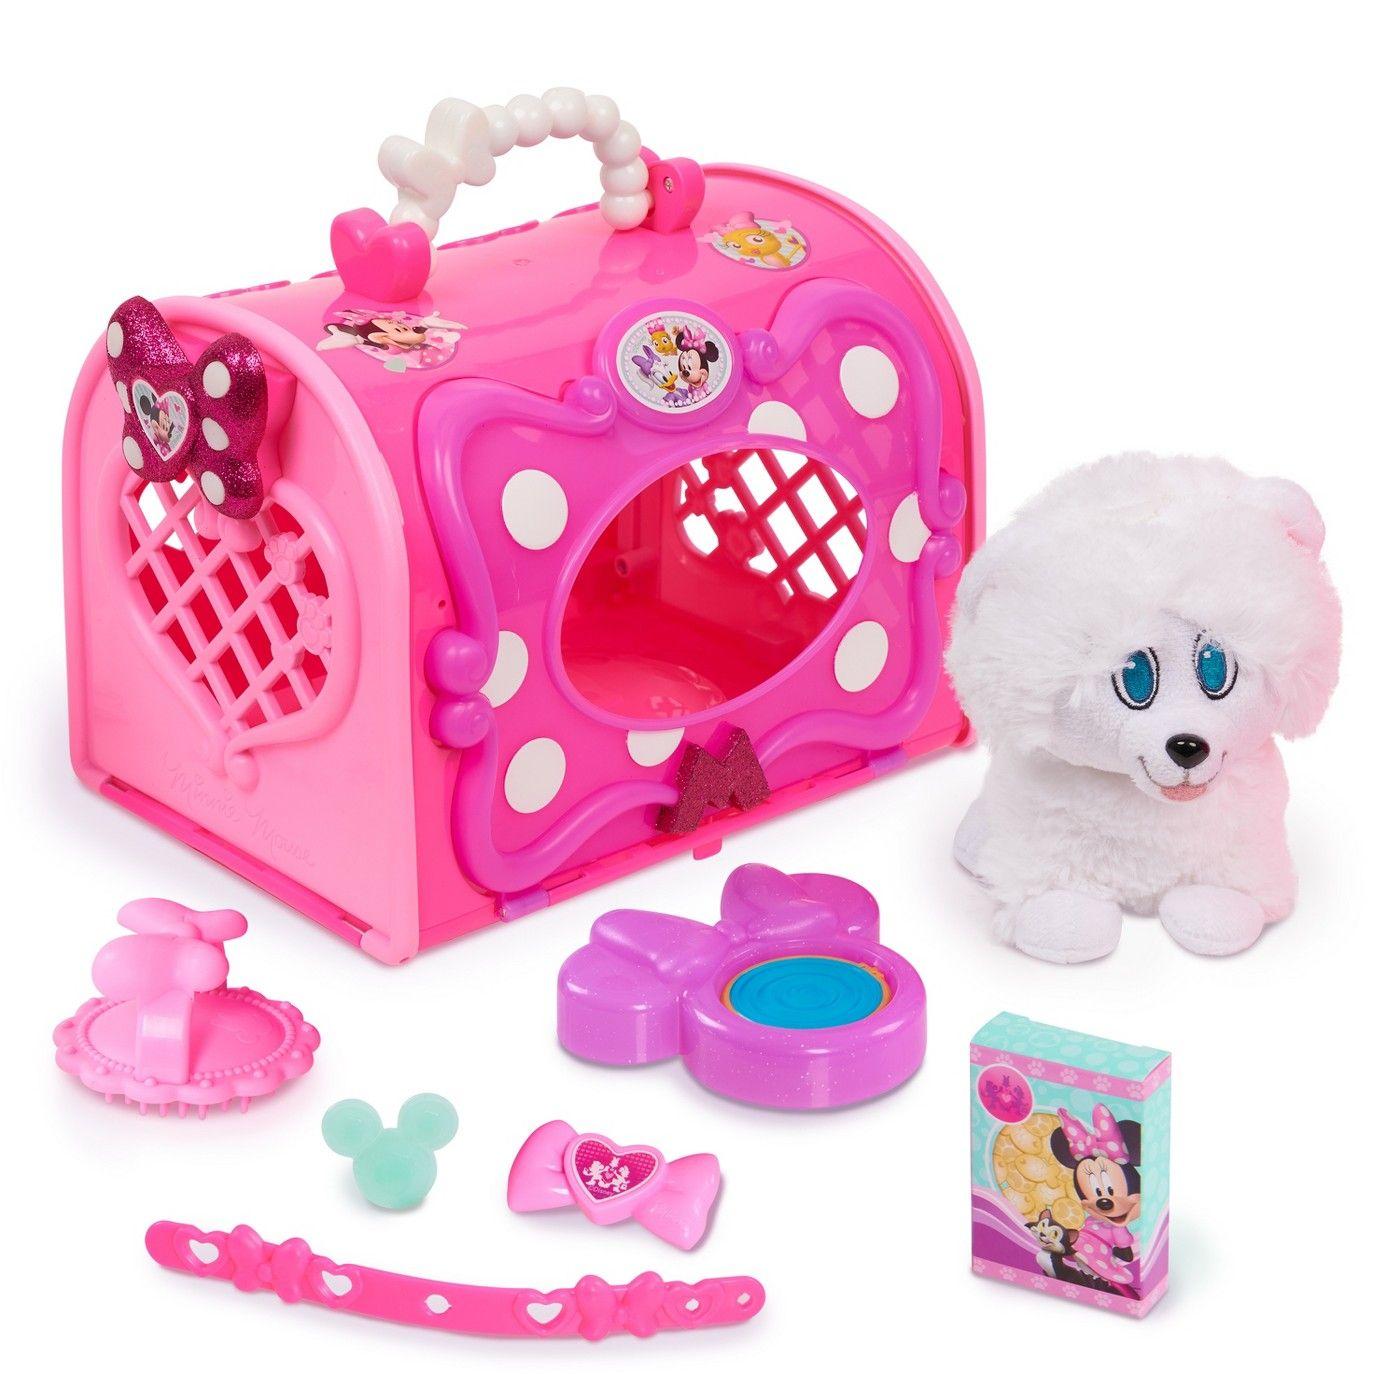 Disney Junior Minnie Mouse Happy Helpers Pet Carrier Minnie Mouse Disney Minnie Mouse Toys Pet Carriers Minnie Mouse